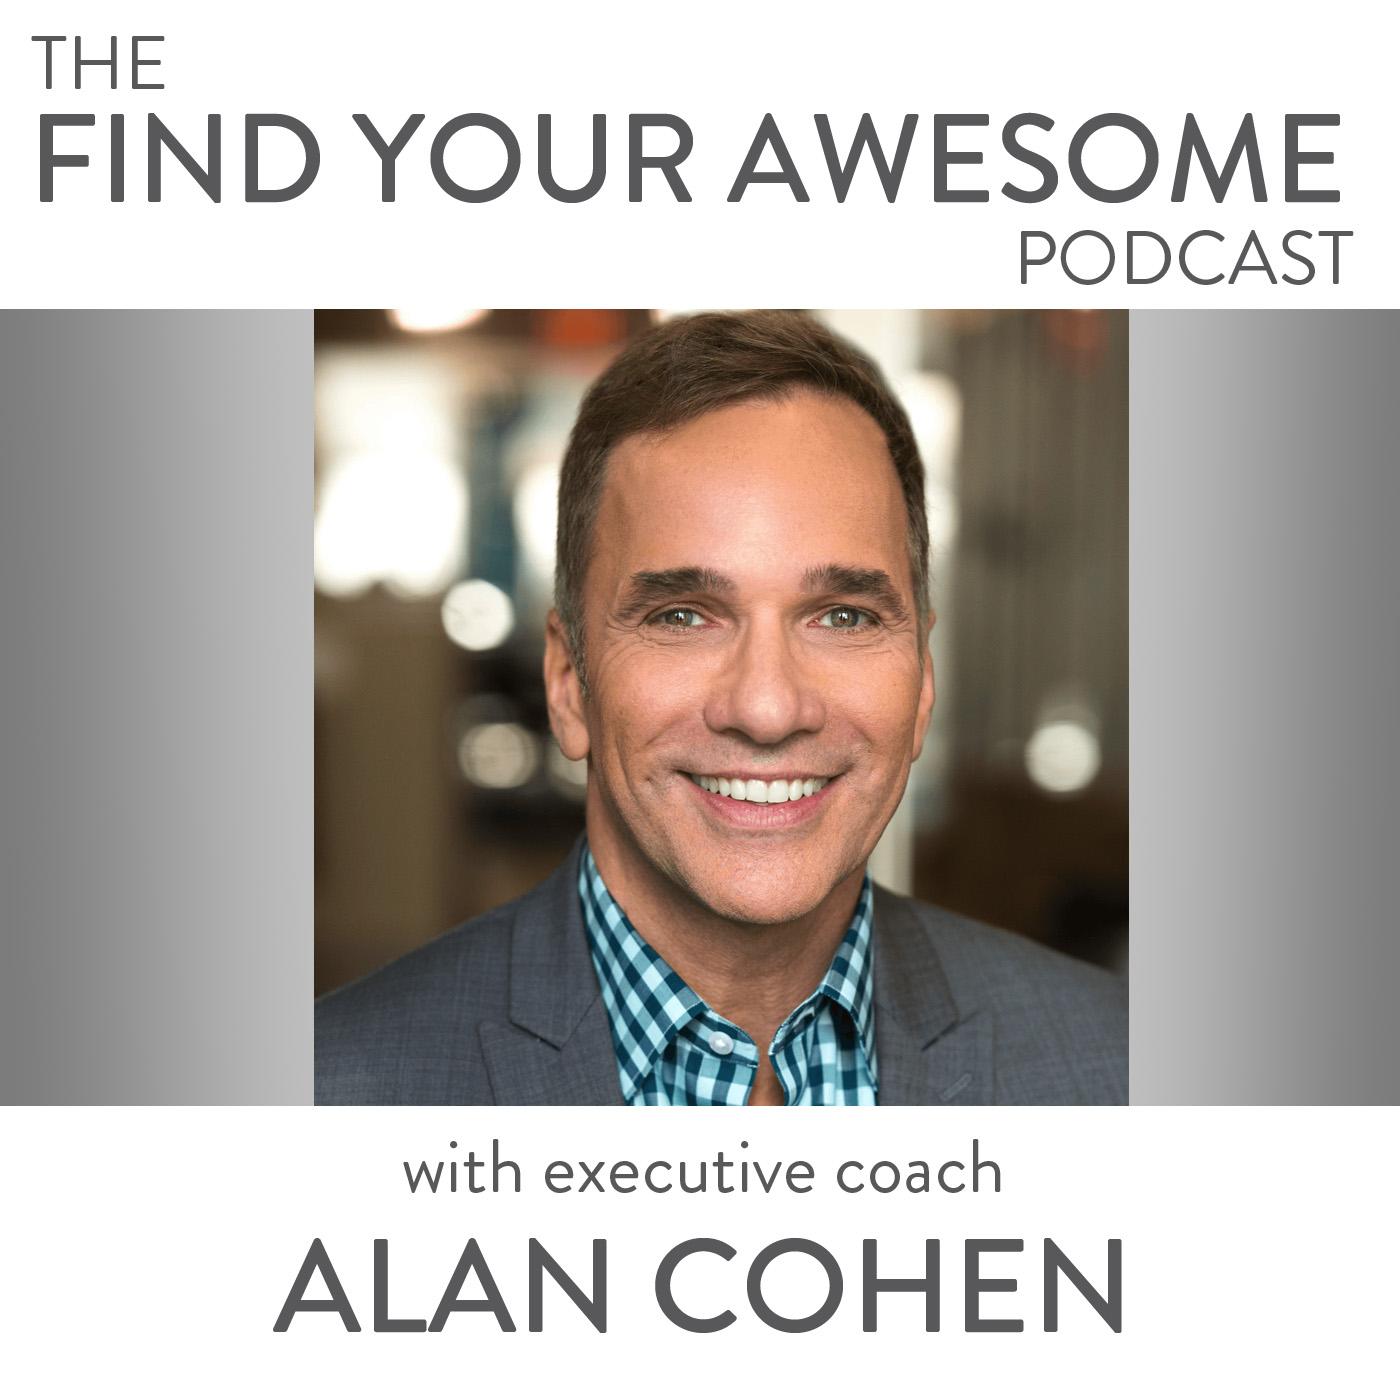 AlanCohen_podcast_coverart.jpg